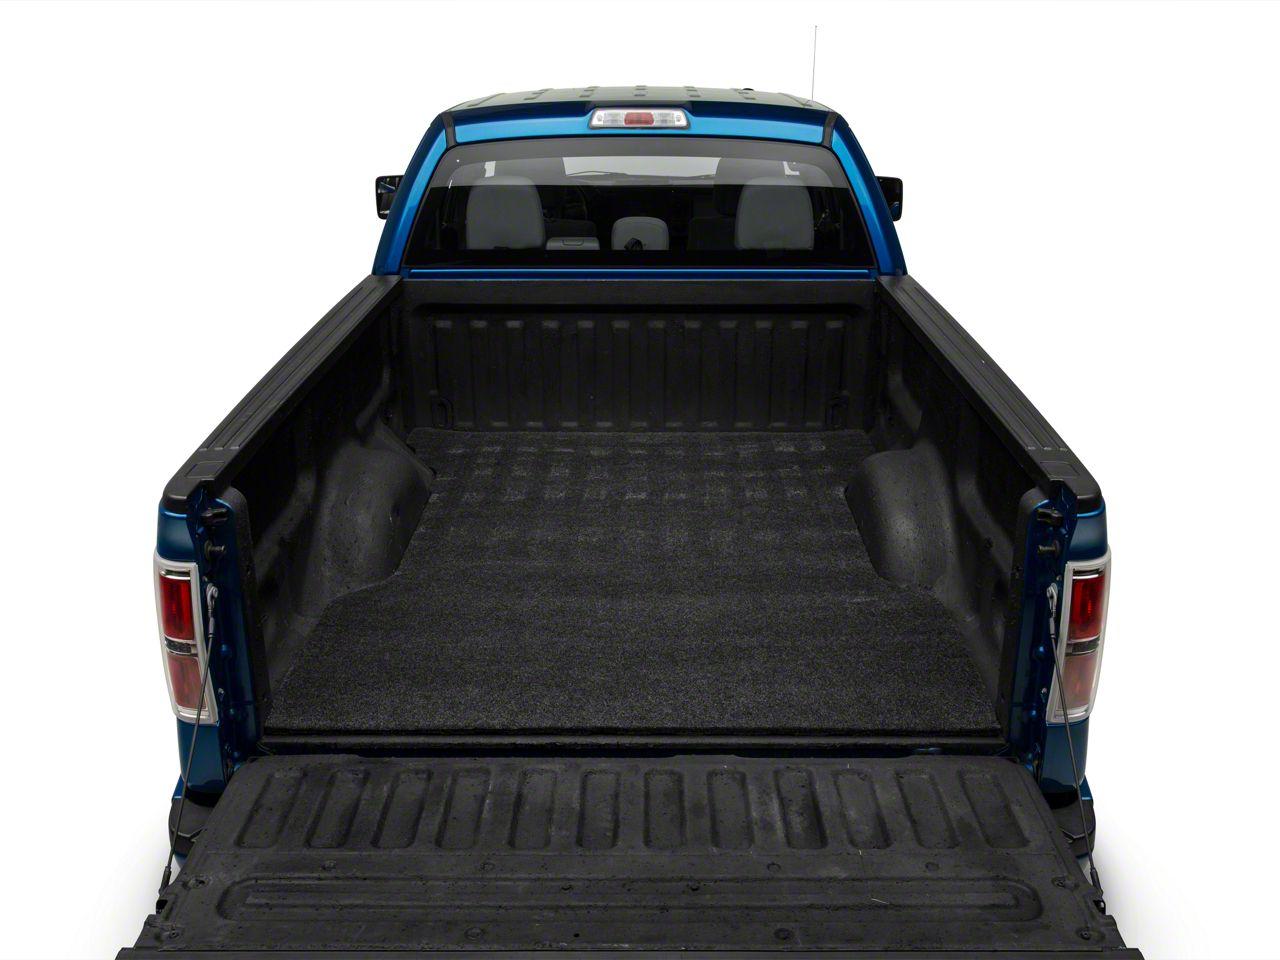 BedRug Bed Mat (04-14 F-150 w/ 6.5 ft. Bed & w/ Factory Drop-In Bed Liner)